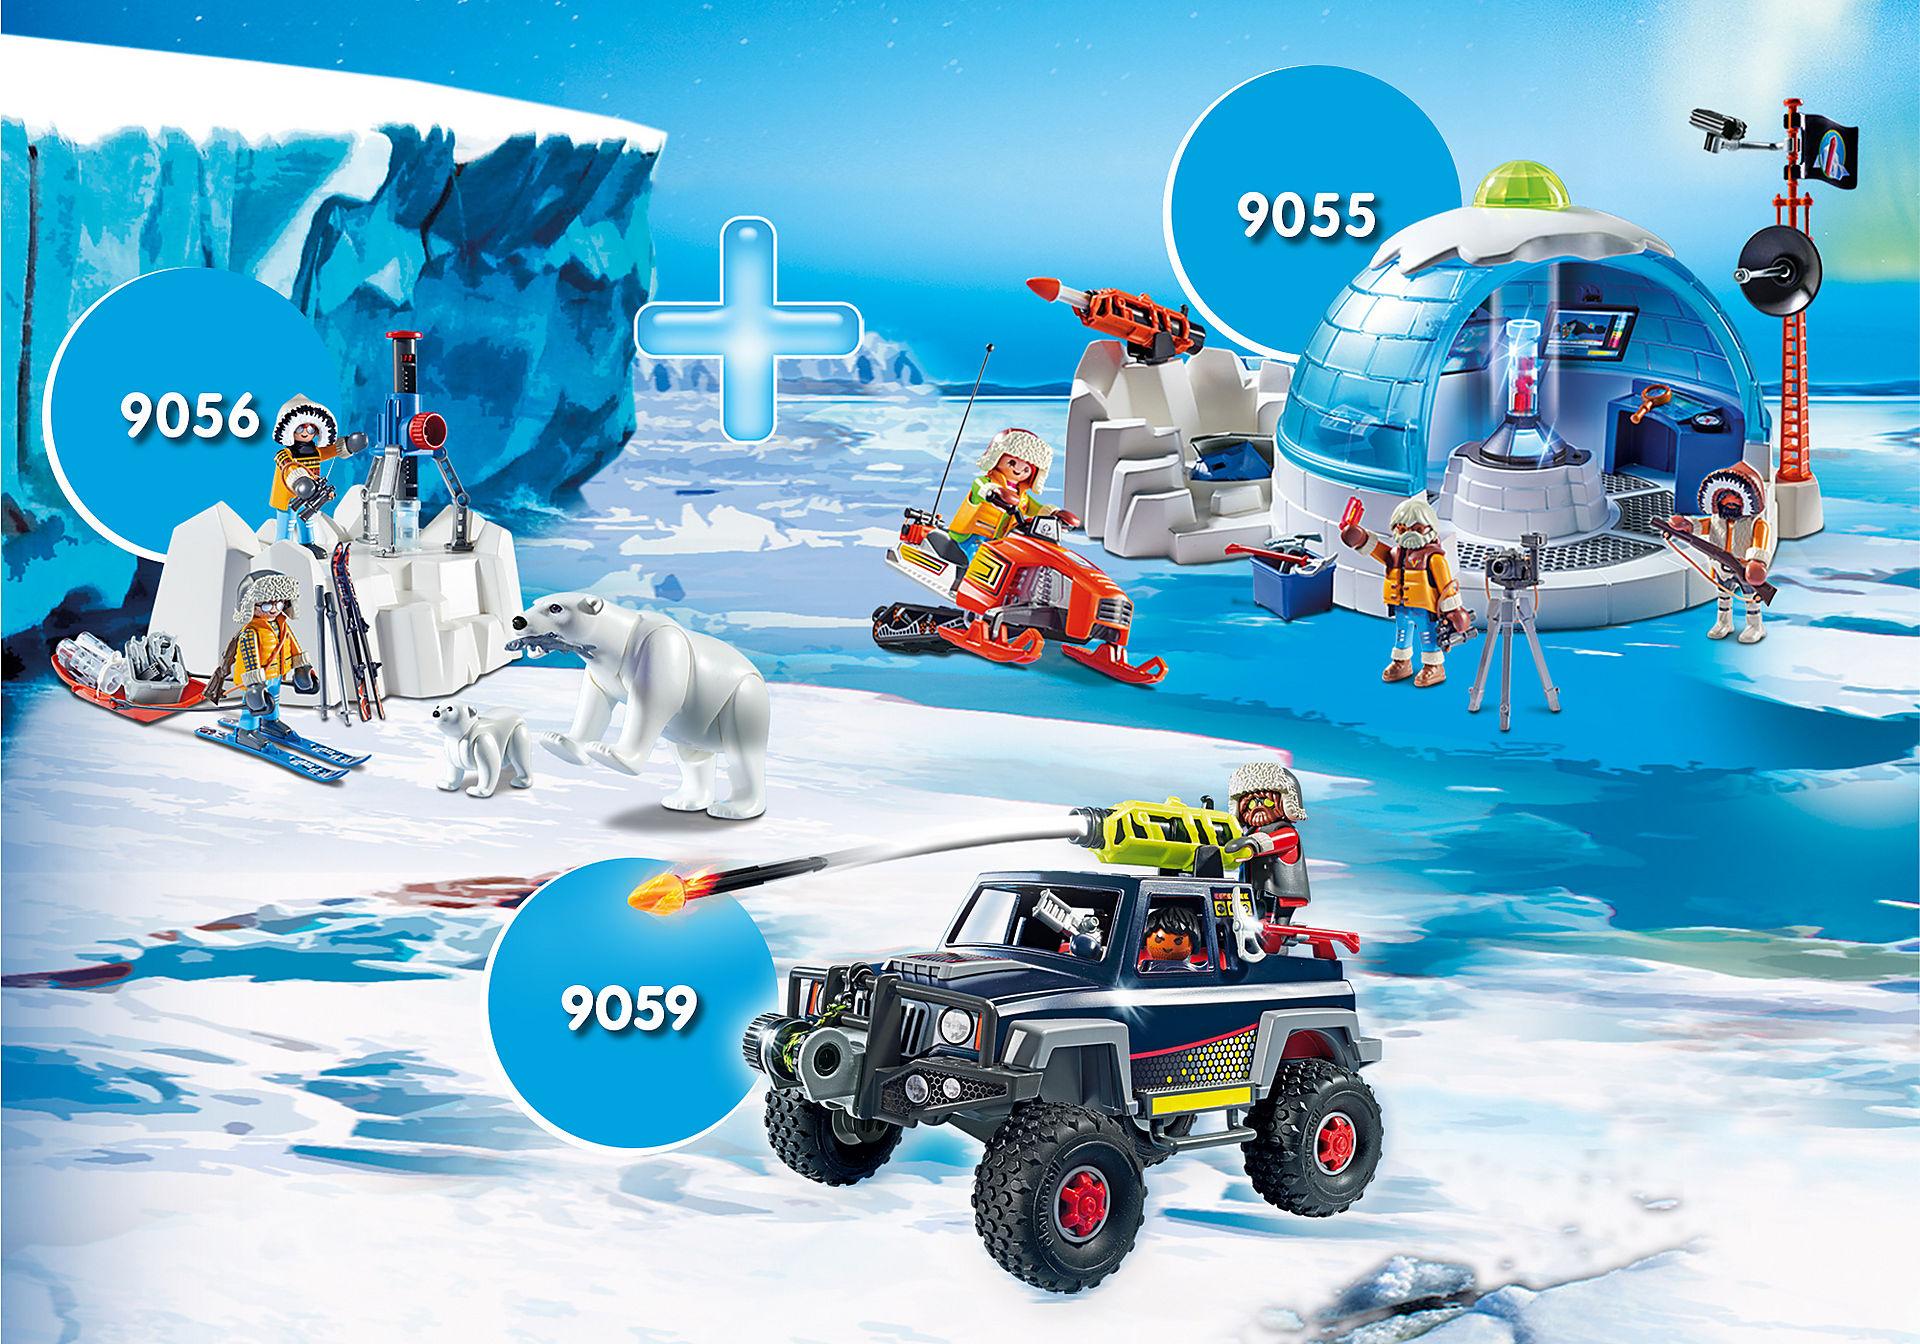 Playmobil Bundle Polar-Expedition inlk. Versand + 15% Rabatt (+viele weitere Bundles)